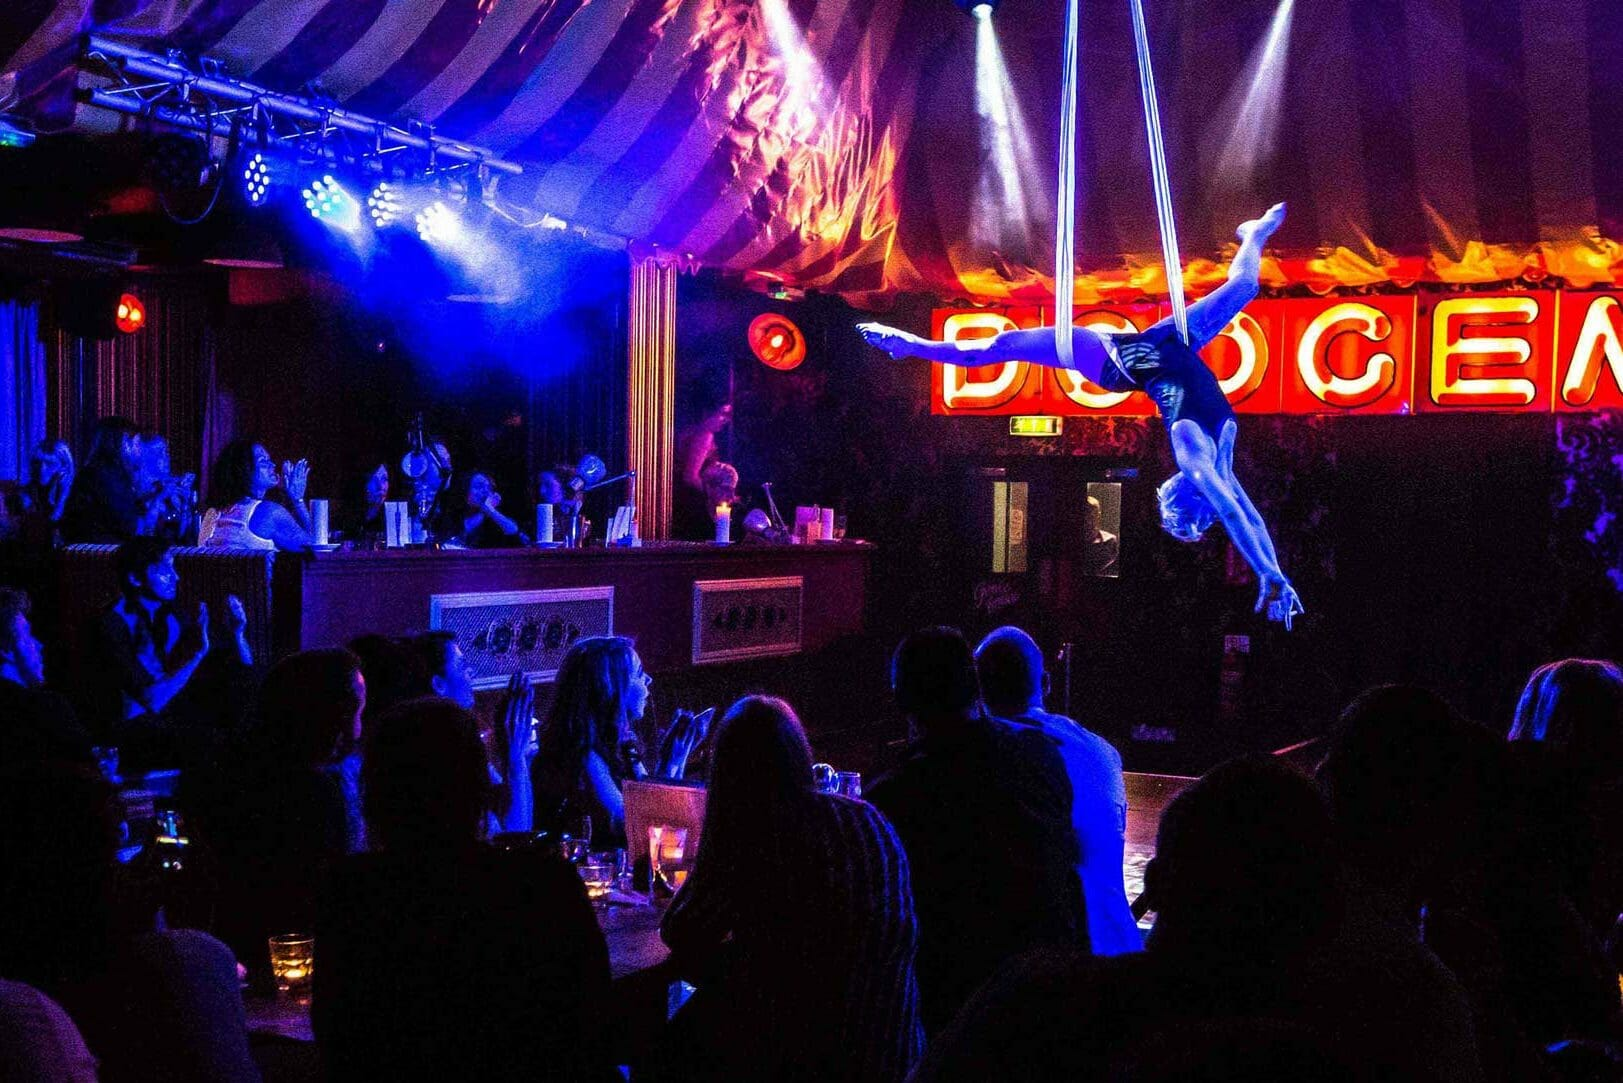 Aeronaut fun birthday bars